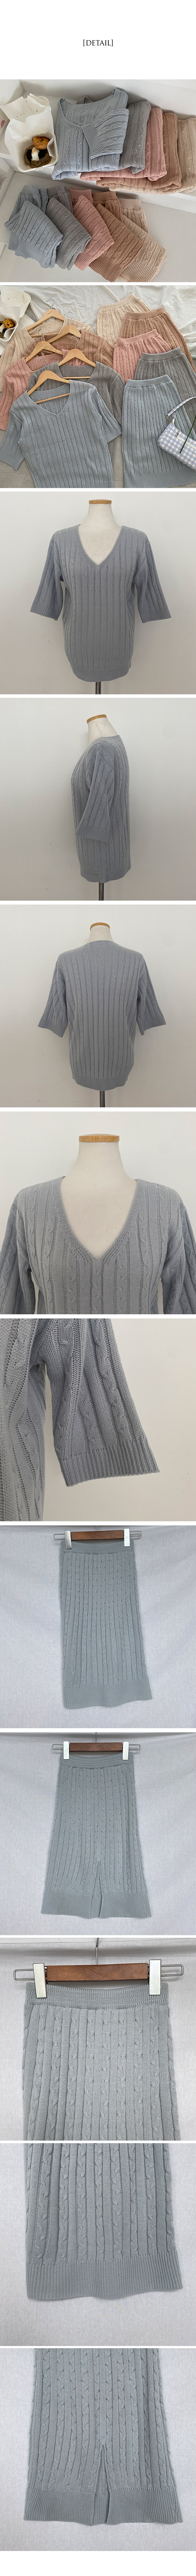 Female Protagonist Knitwear Two-Piece Set